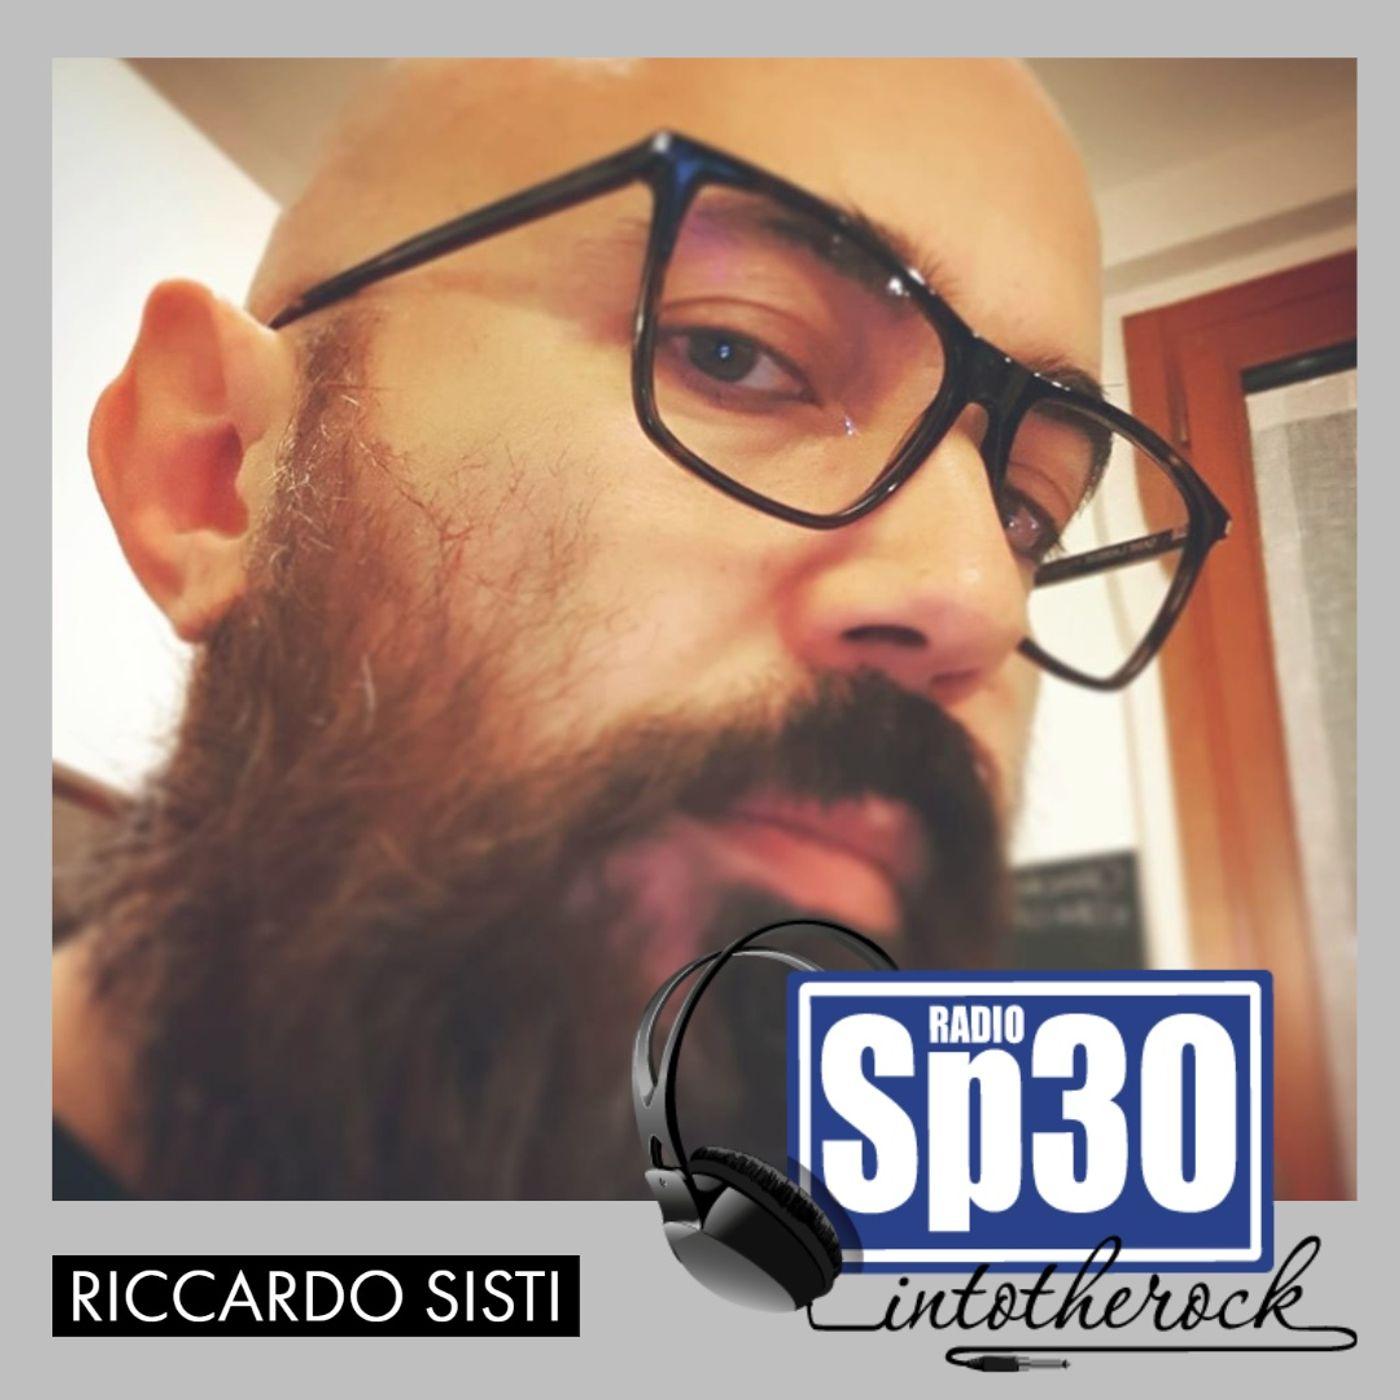 Into the Rock - #RadioSP30